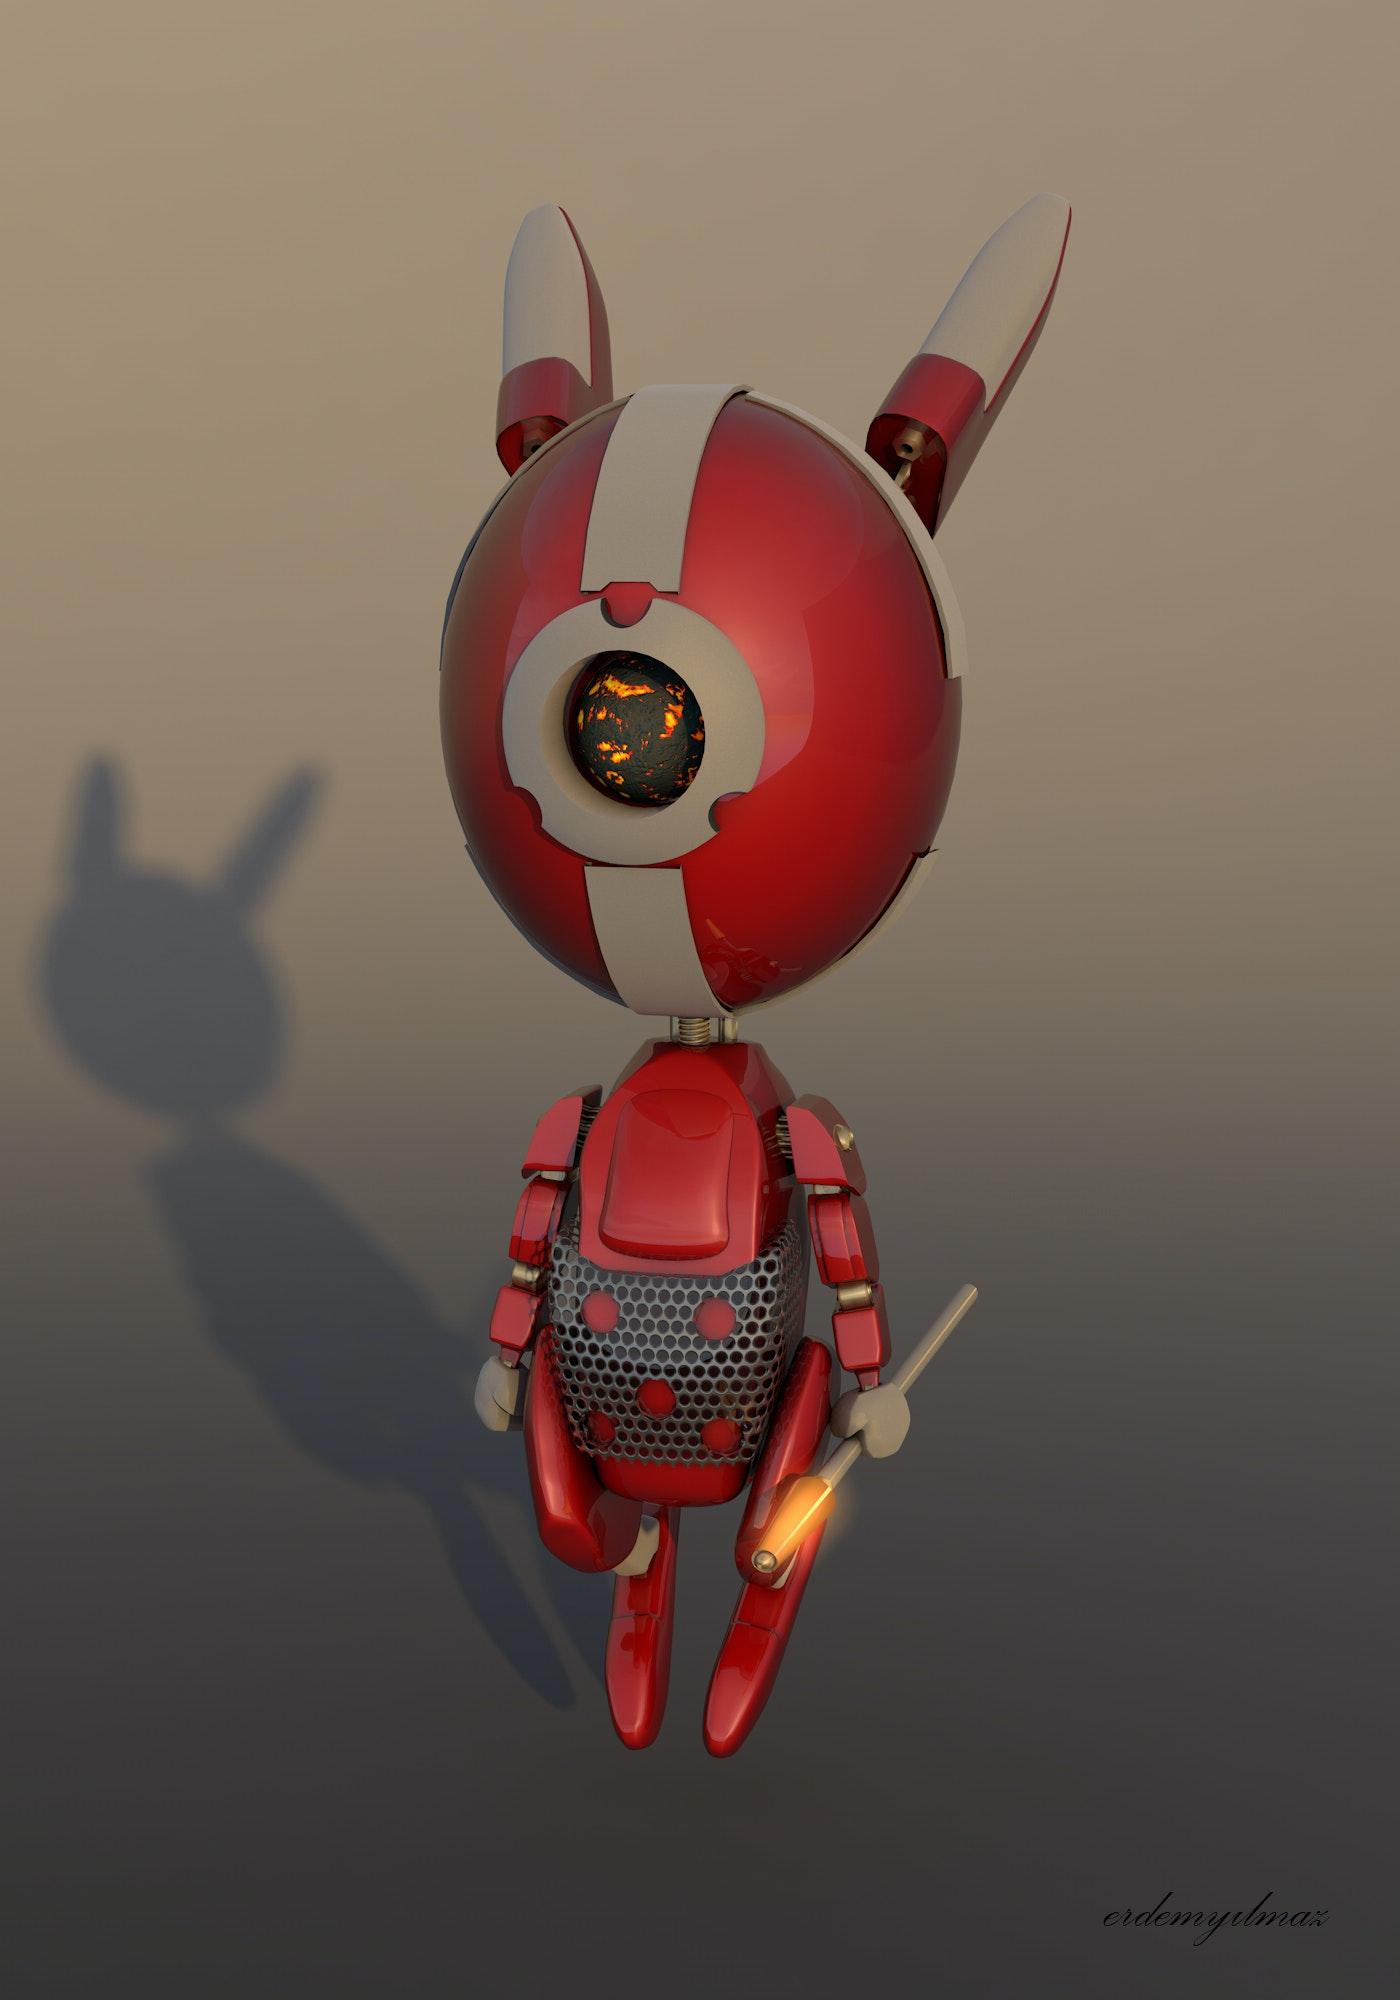 free stock photo of robocop robocop ed209 robot